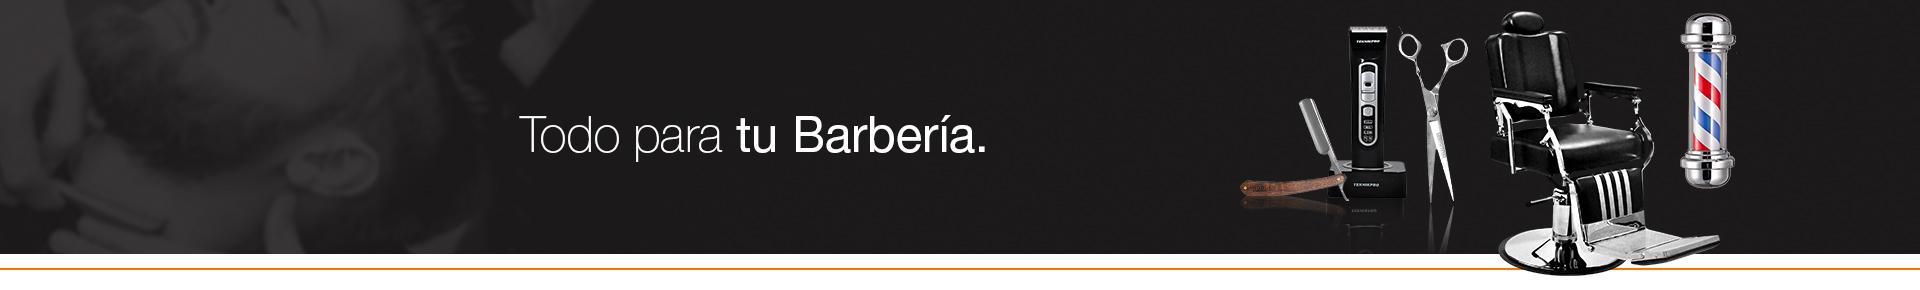 compra Barberia online